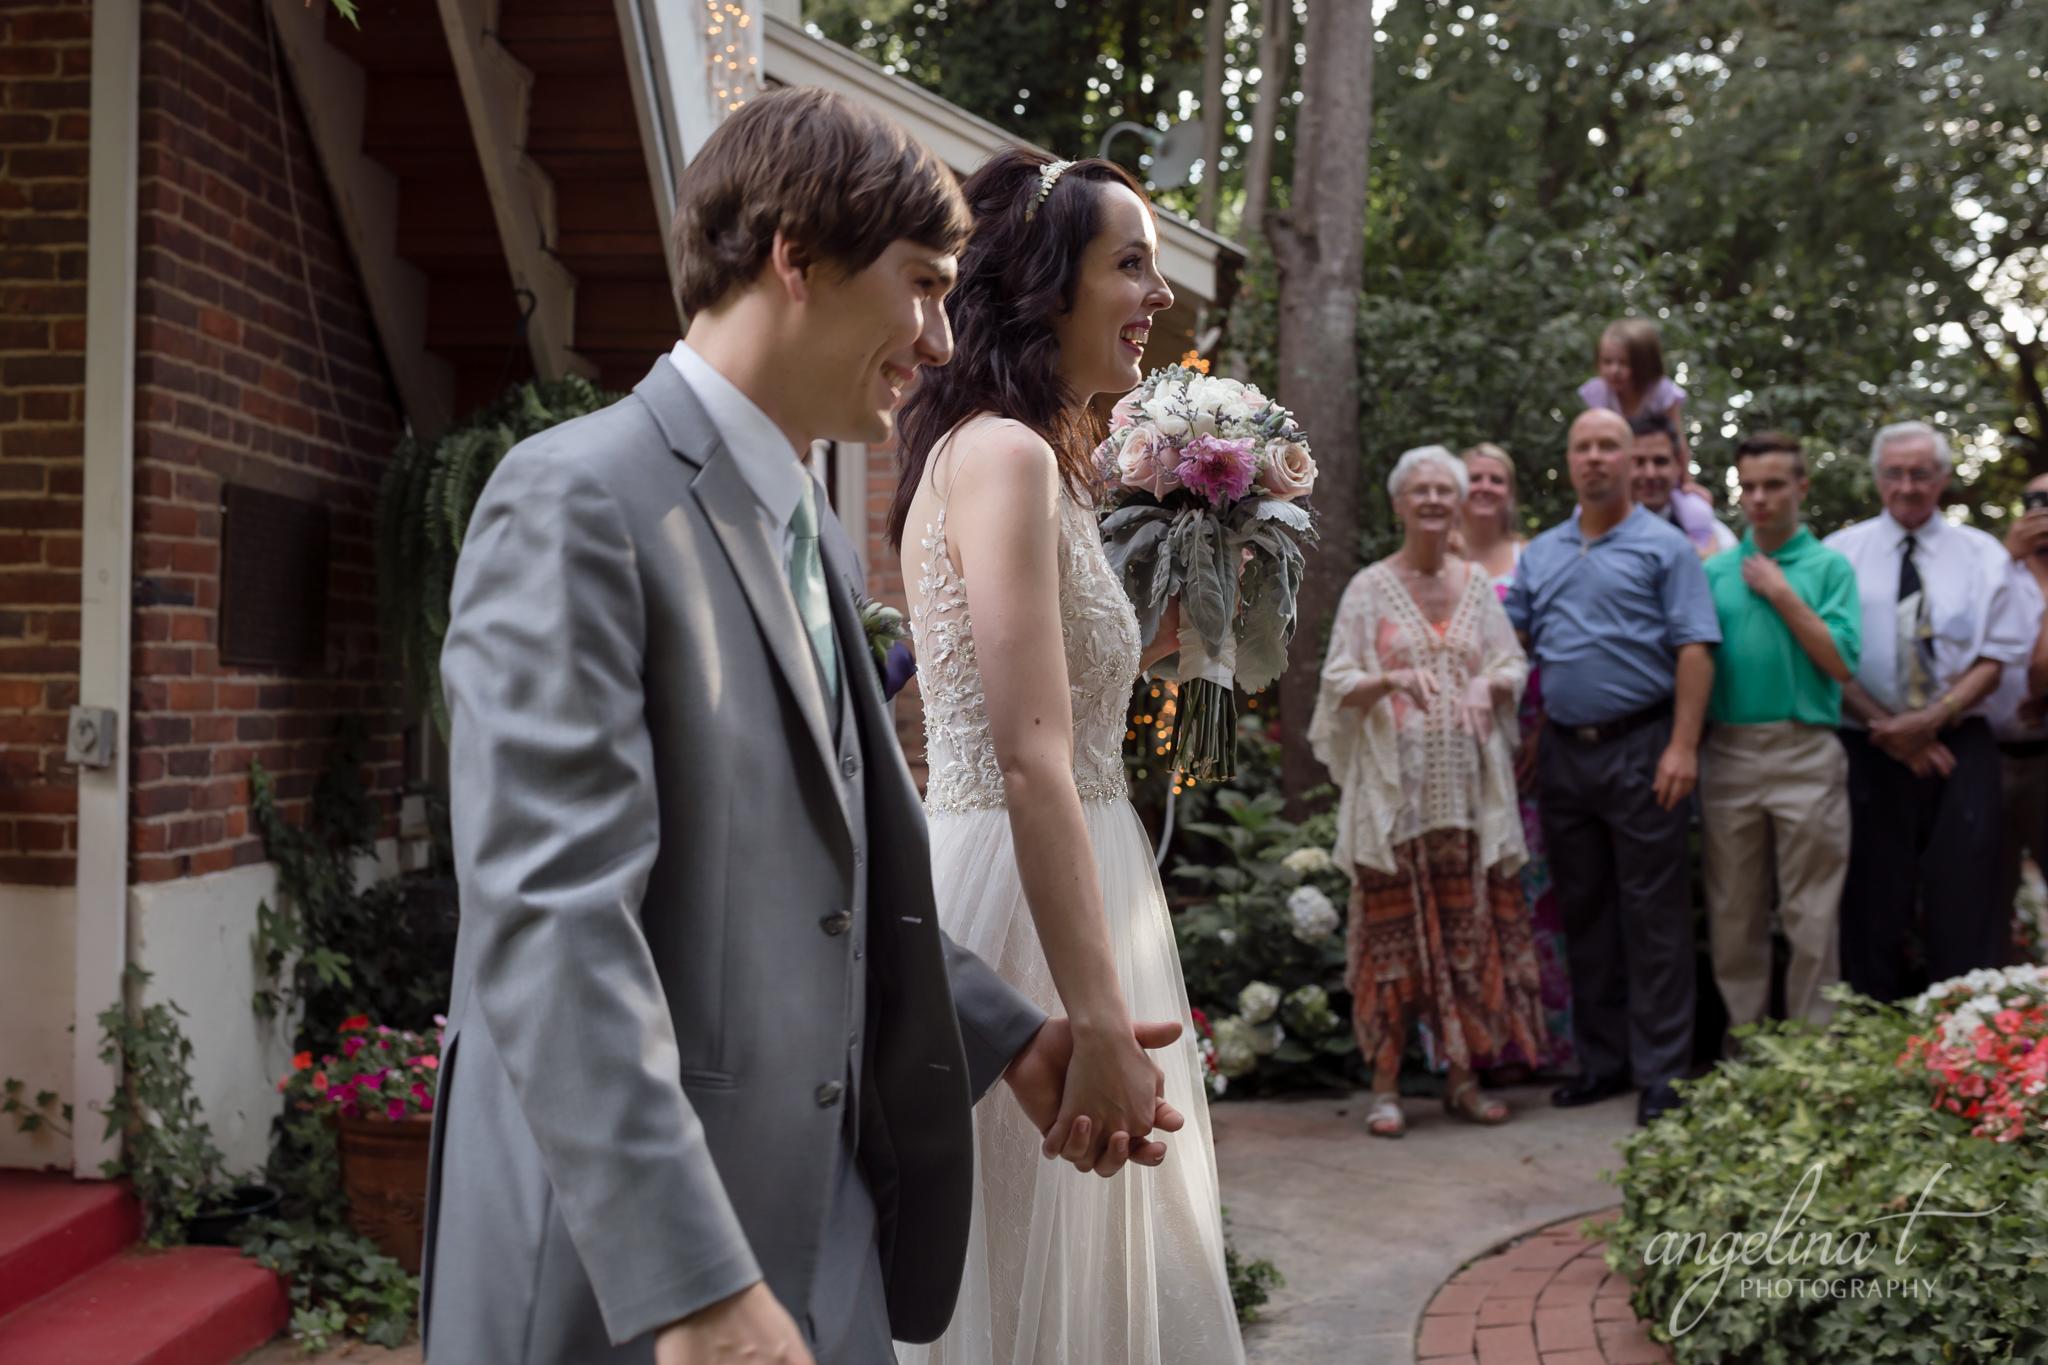 Heirloom-Inn-Garden-Wedding-Photography-Ione-66.JPG